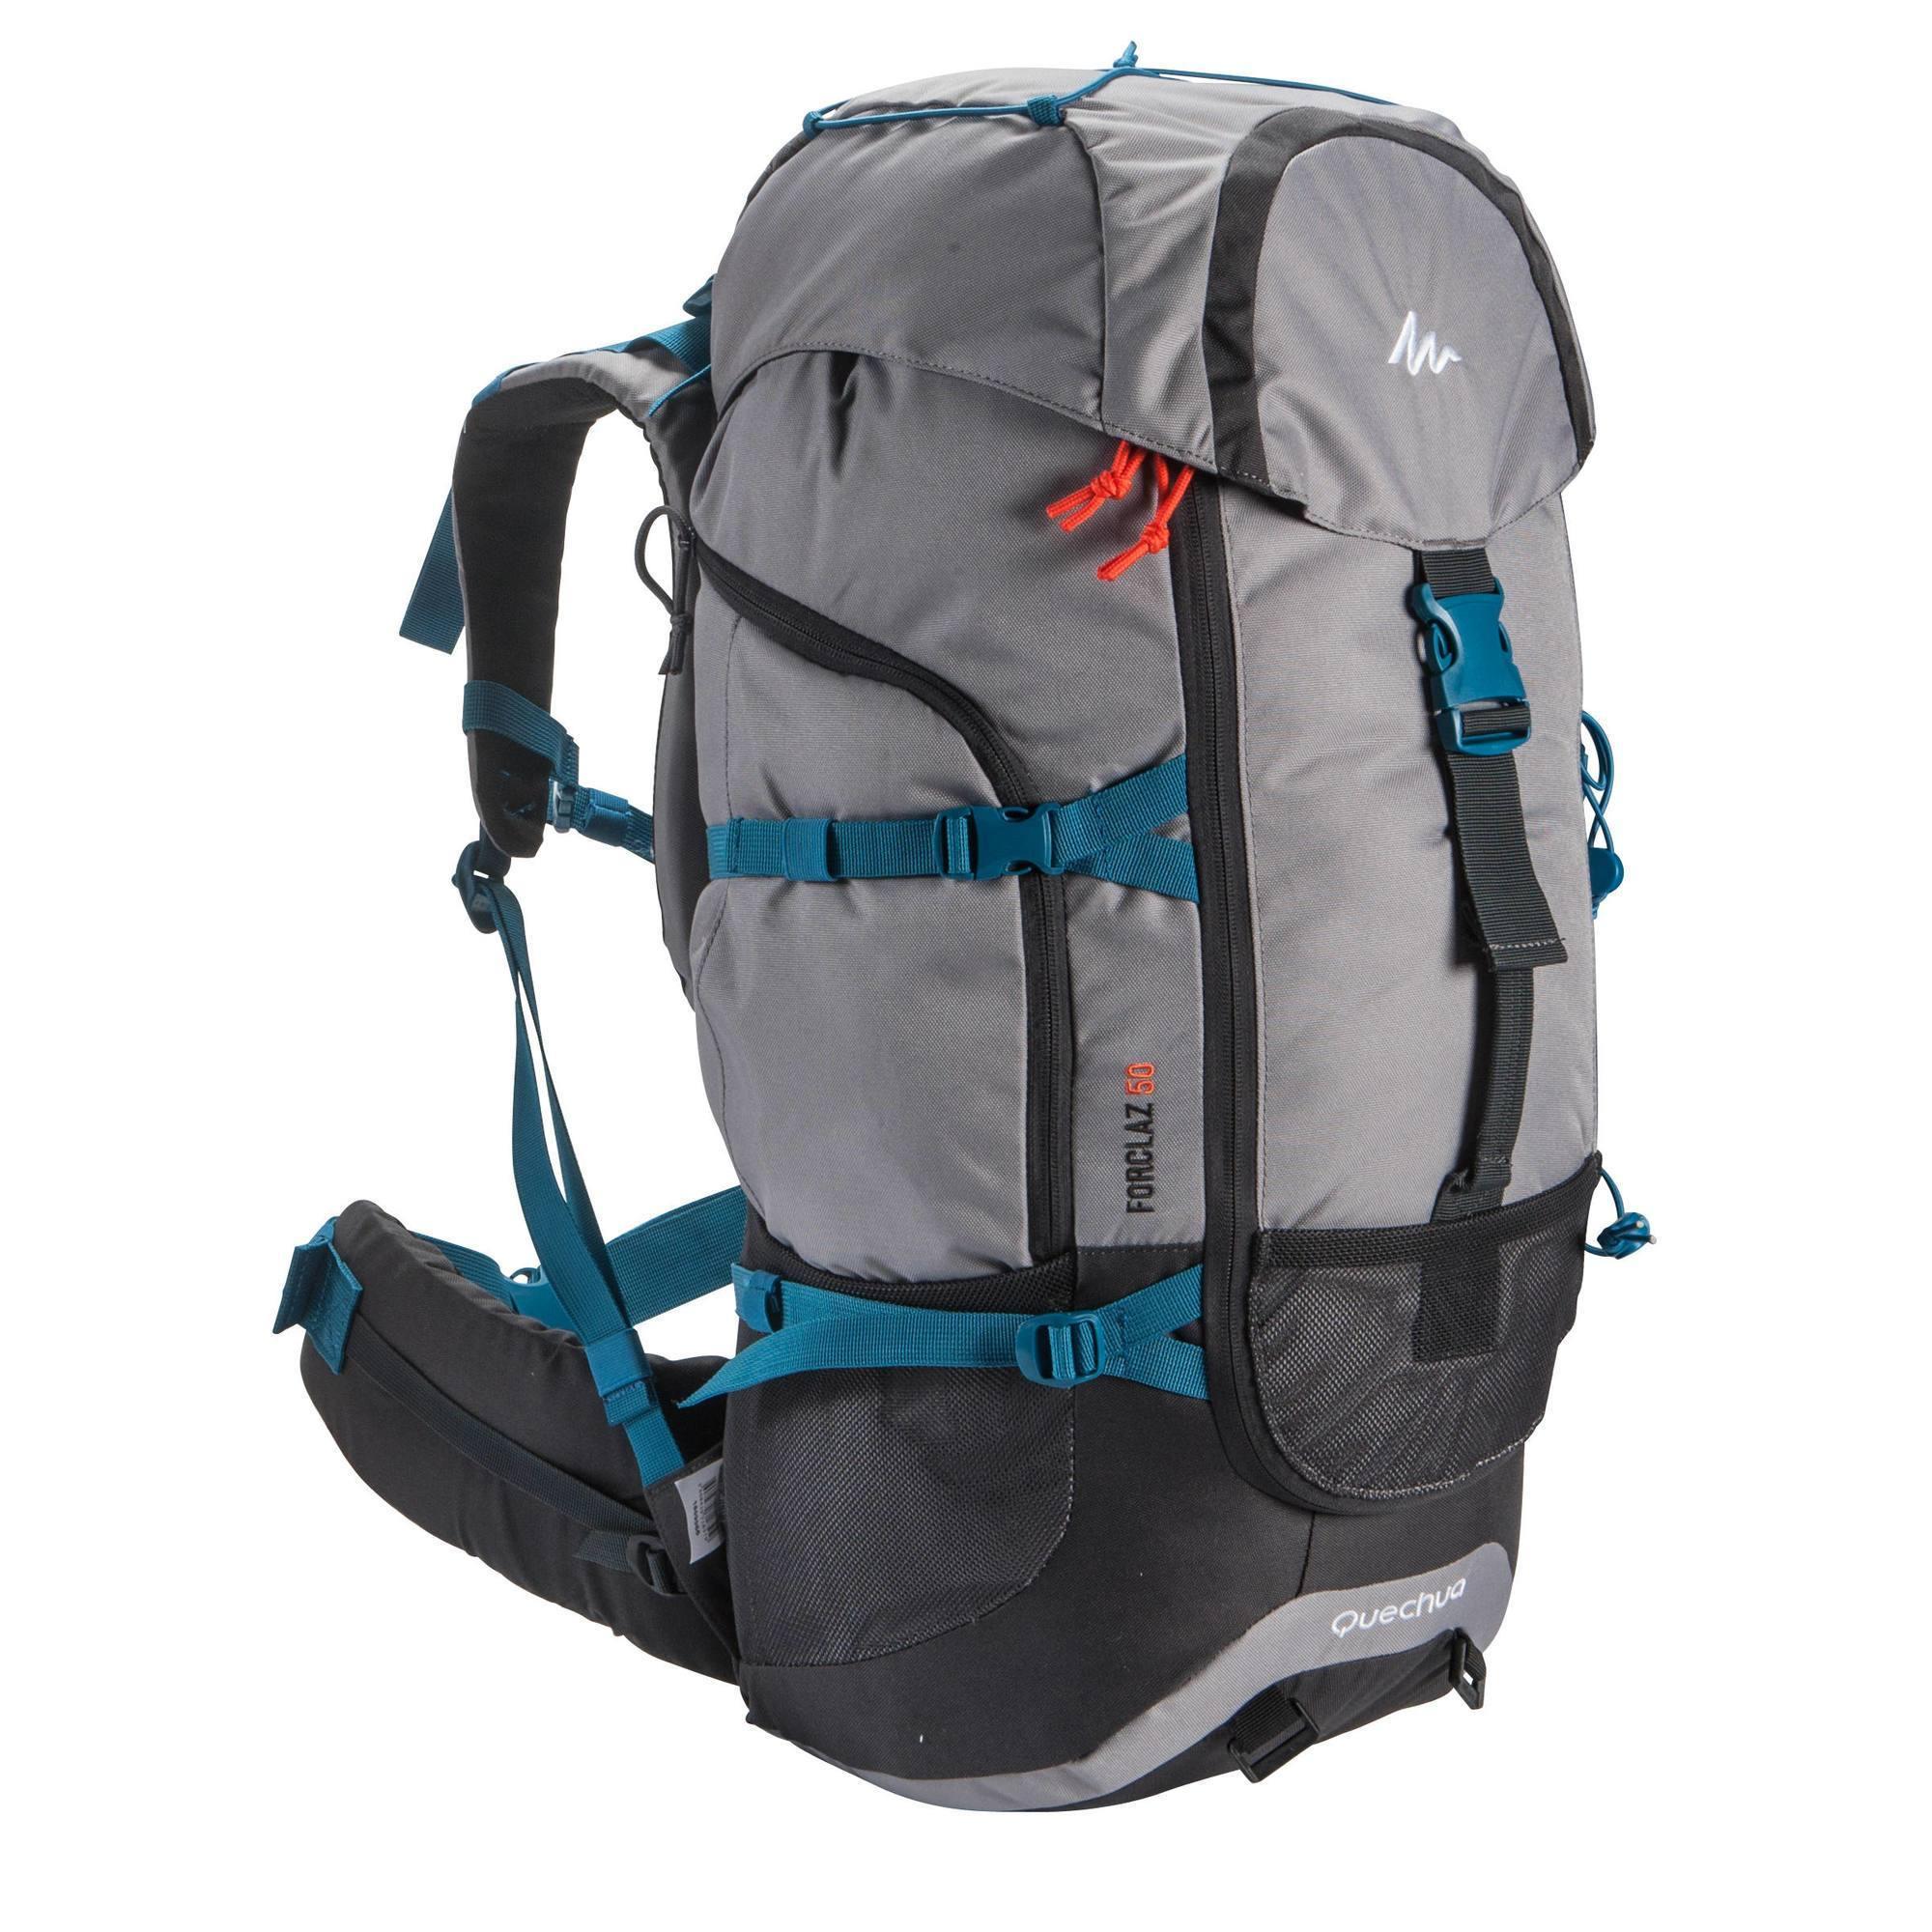 sac camping decathlon